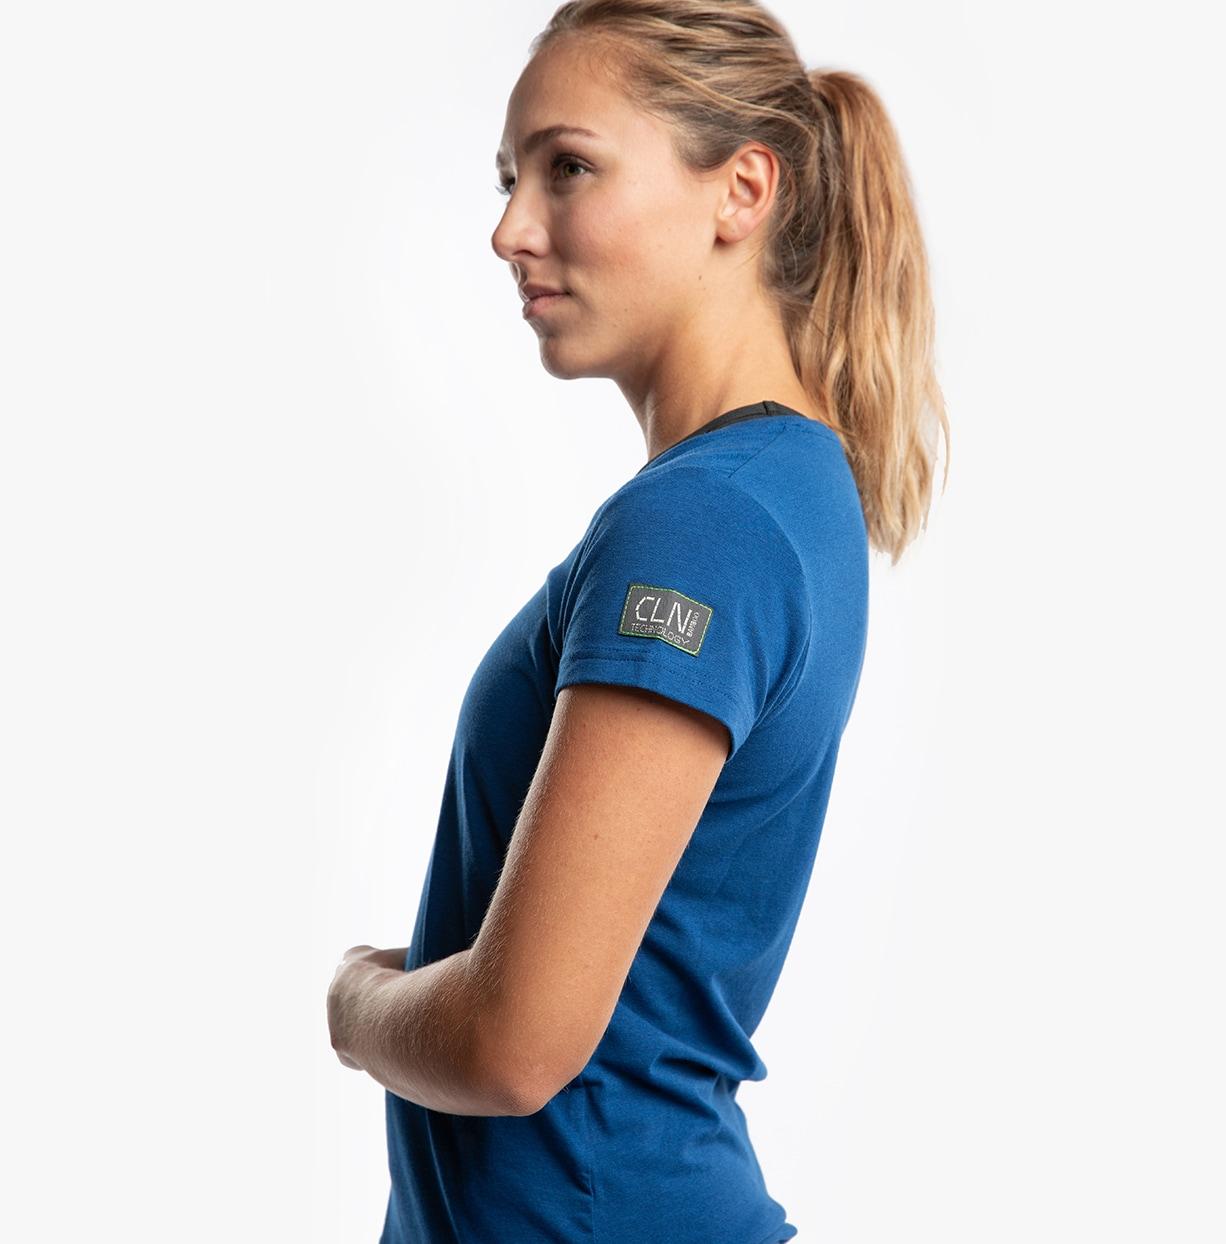 CLN Bamboo ws T-shirt Peony blue